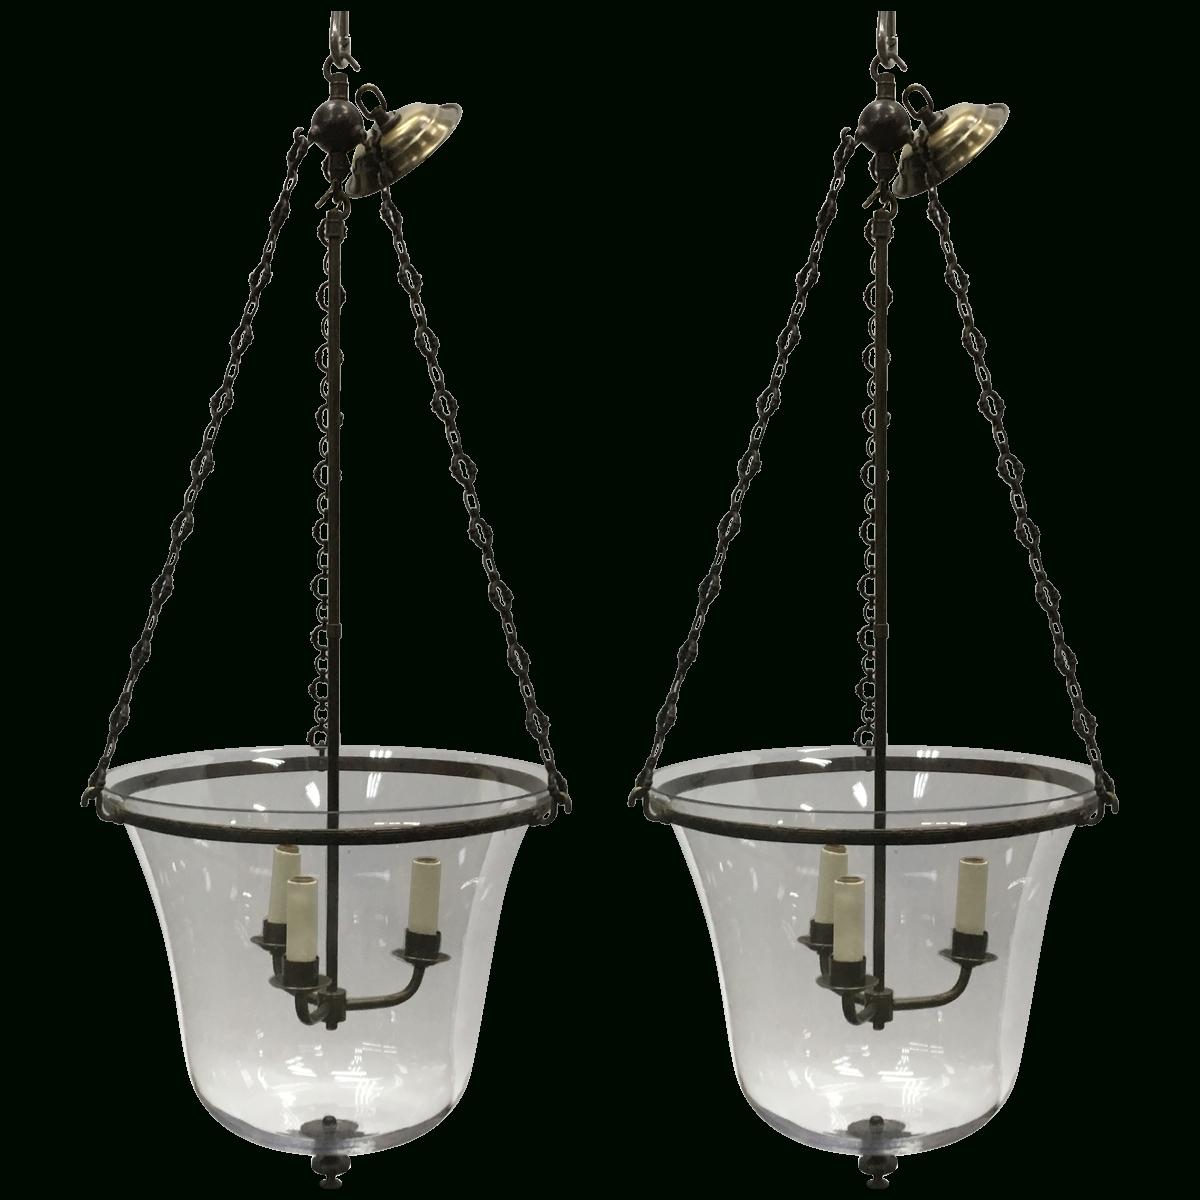 Viyet – Designer Furniture – Lighting – Vaughan Designs Paxton Bell Intended For Current Vaughan Outdoor Lanterns (View 18 of 20)